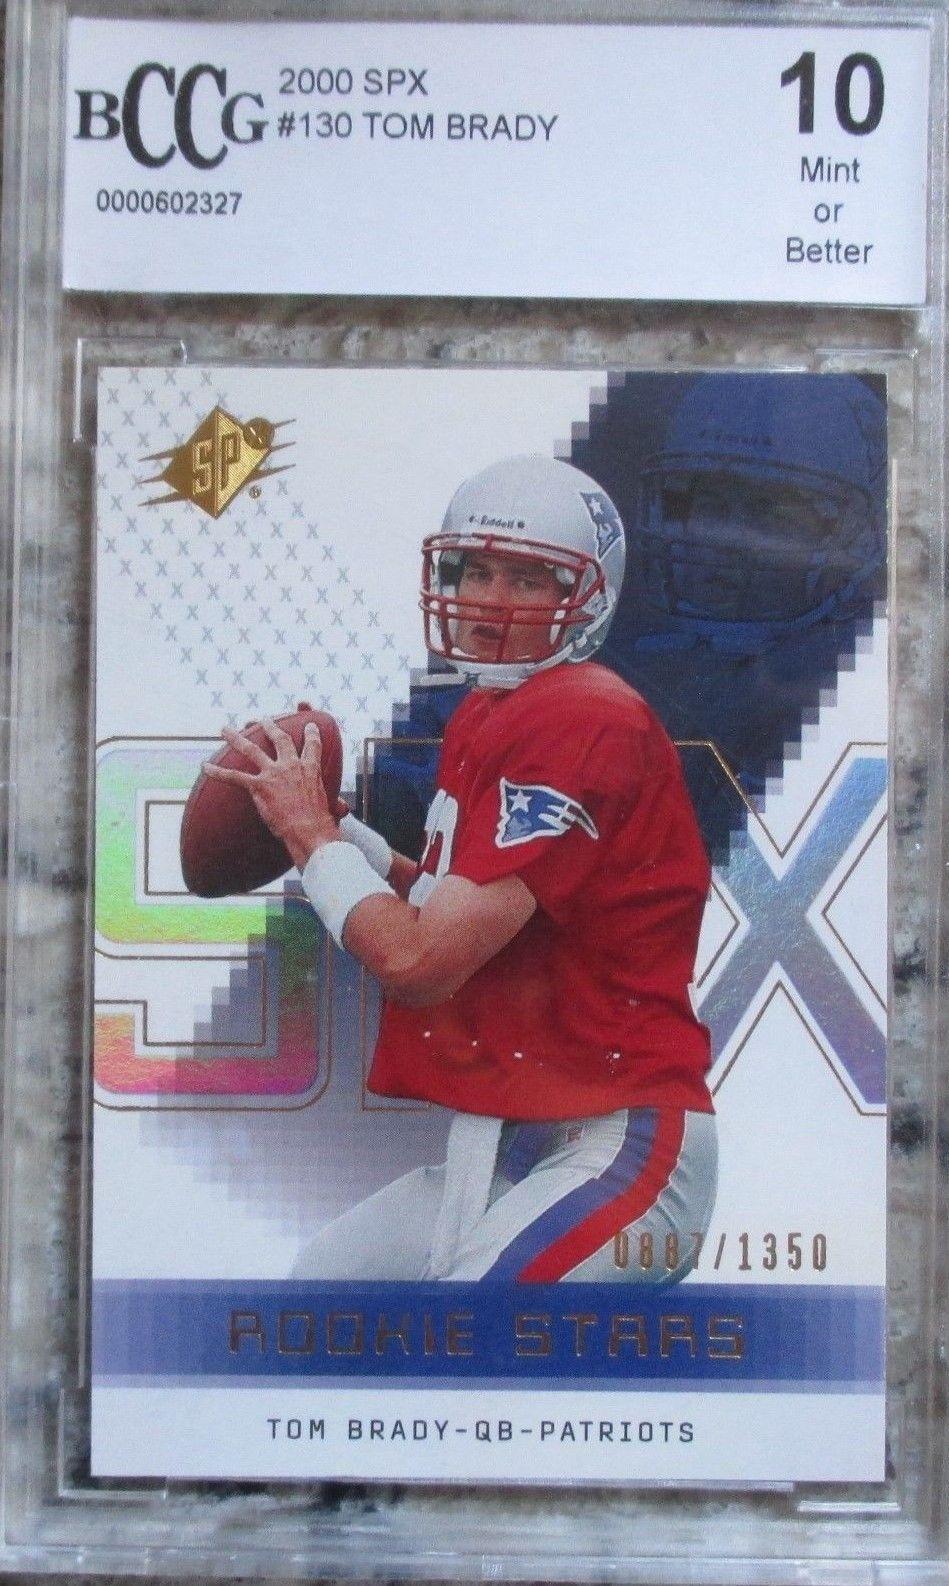 2000 spx tom brady rookie card beckett grade mint 10 tom